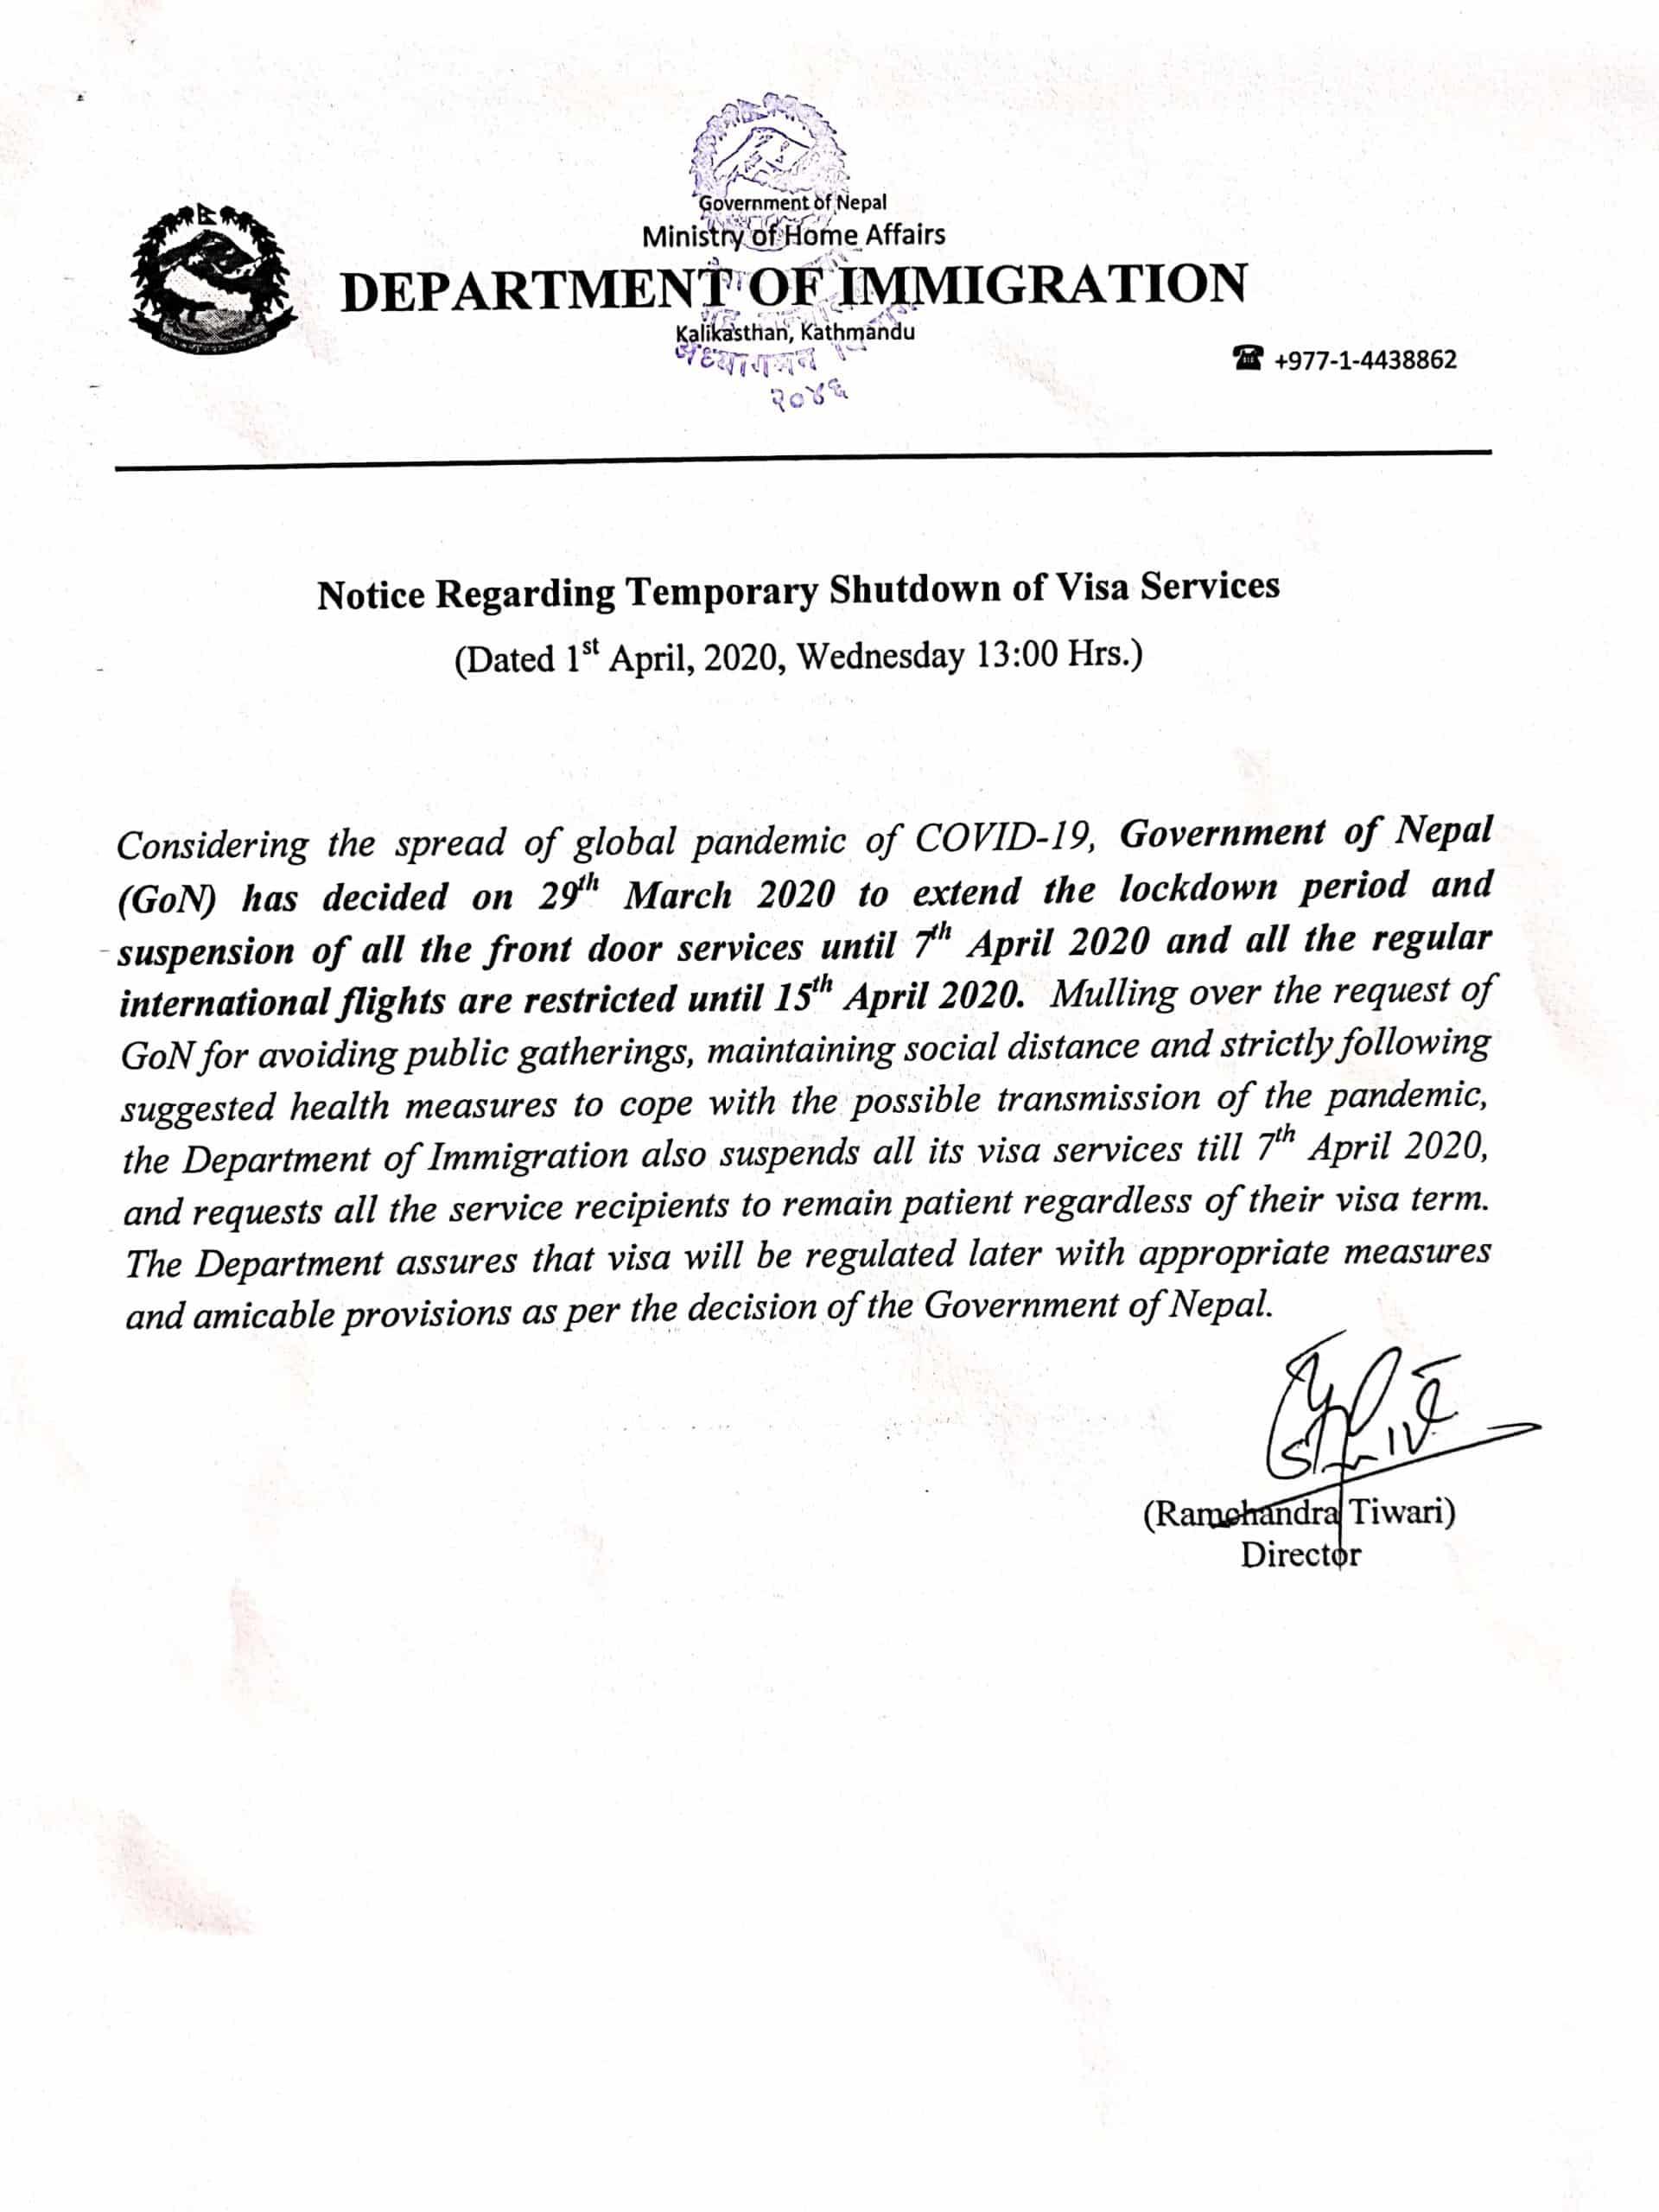 temporary shutdown of visa services